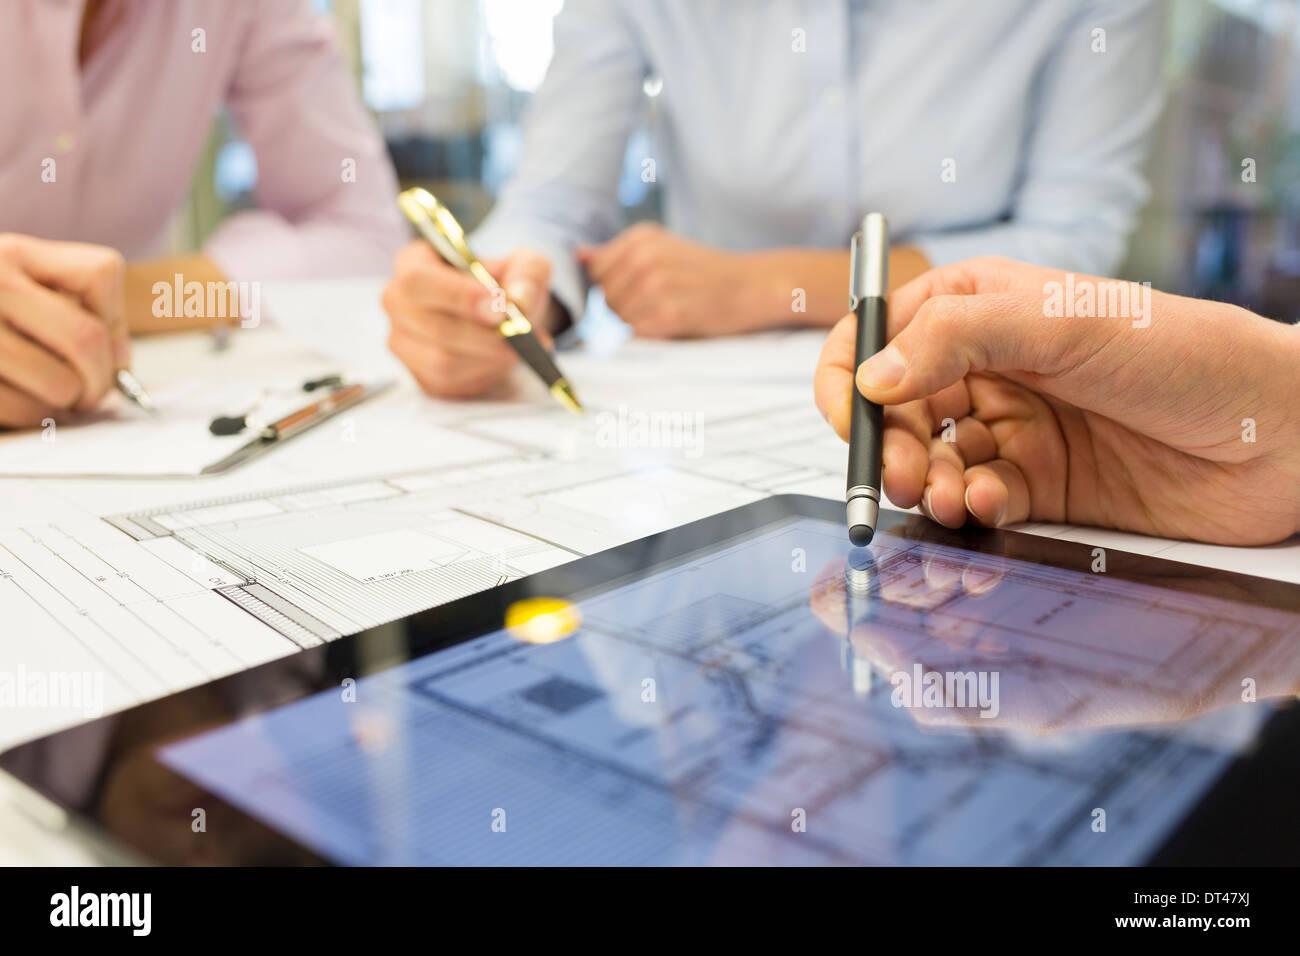 Business team desk architect man woman digital tablet blueprint construction - Stock Image